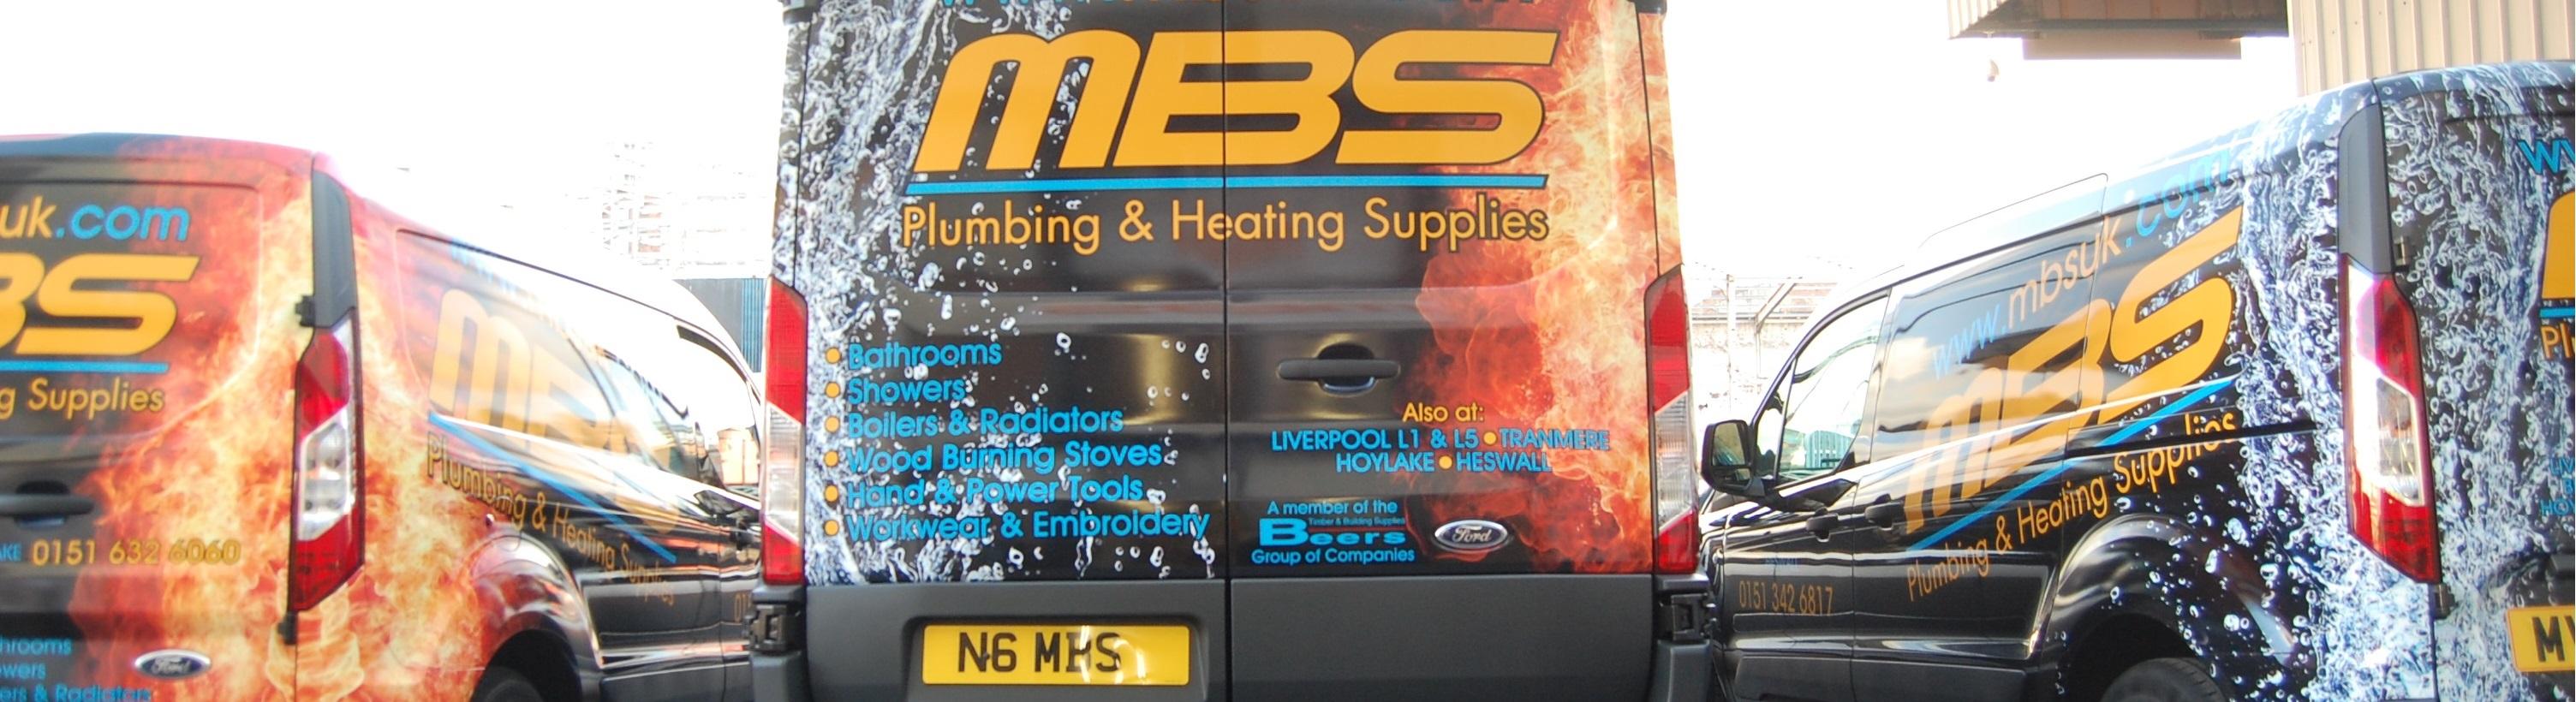 Plumbing, Heating & Electrical